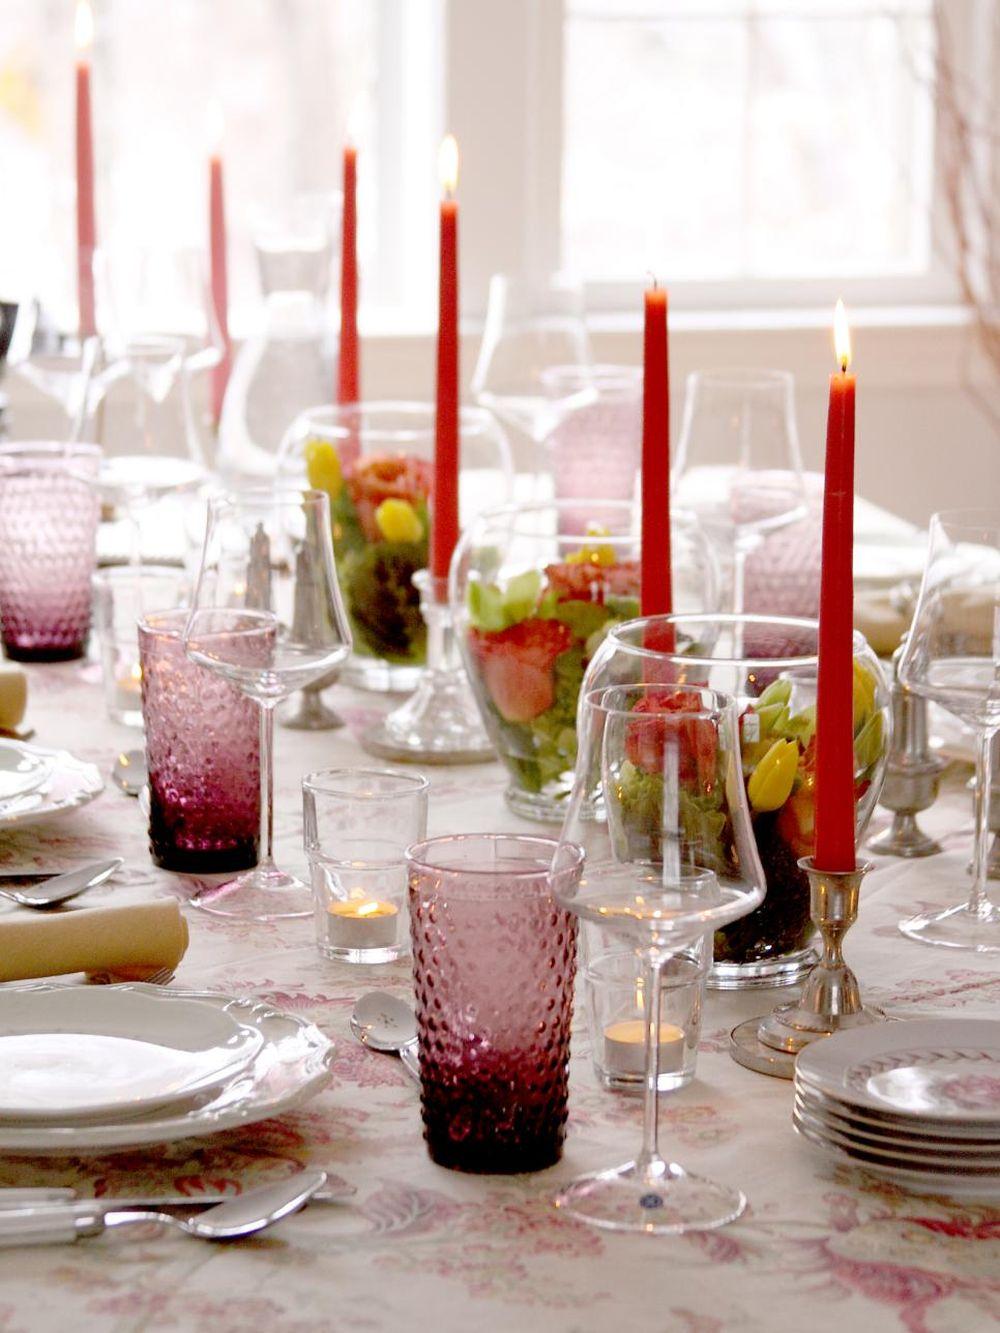 adelaparvu.com despre cum se aranjeaza masa pentru invitati in ocazii formale (1)